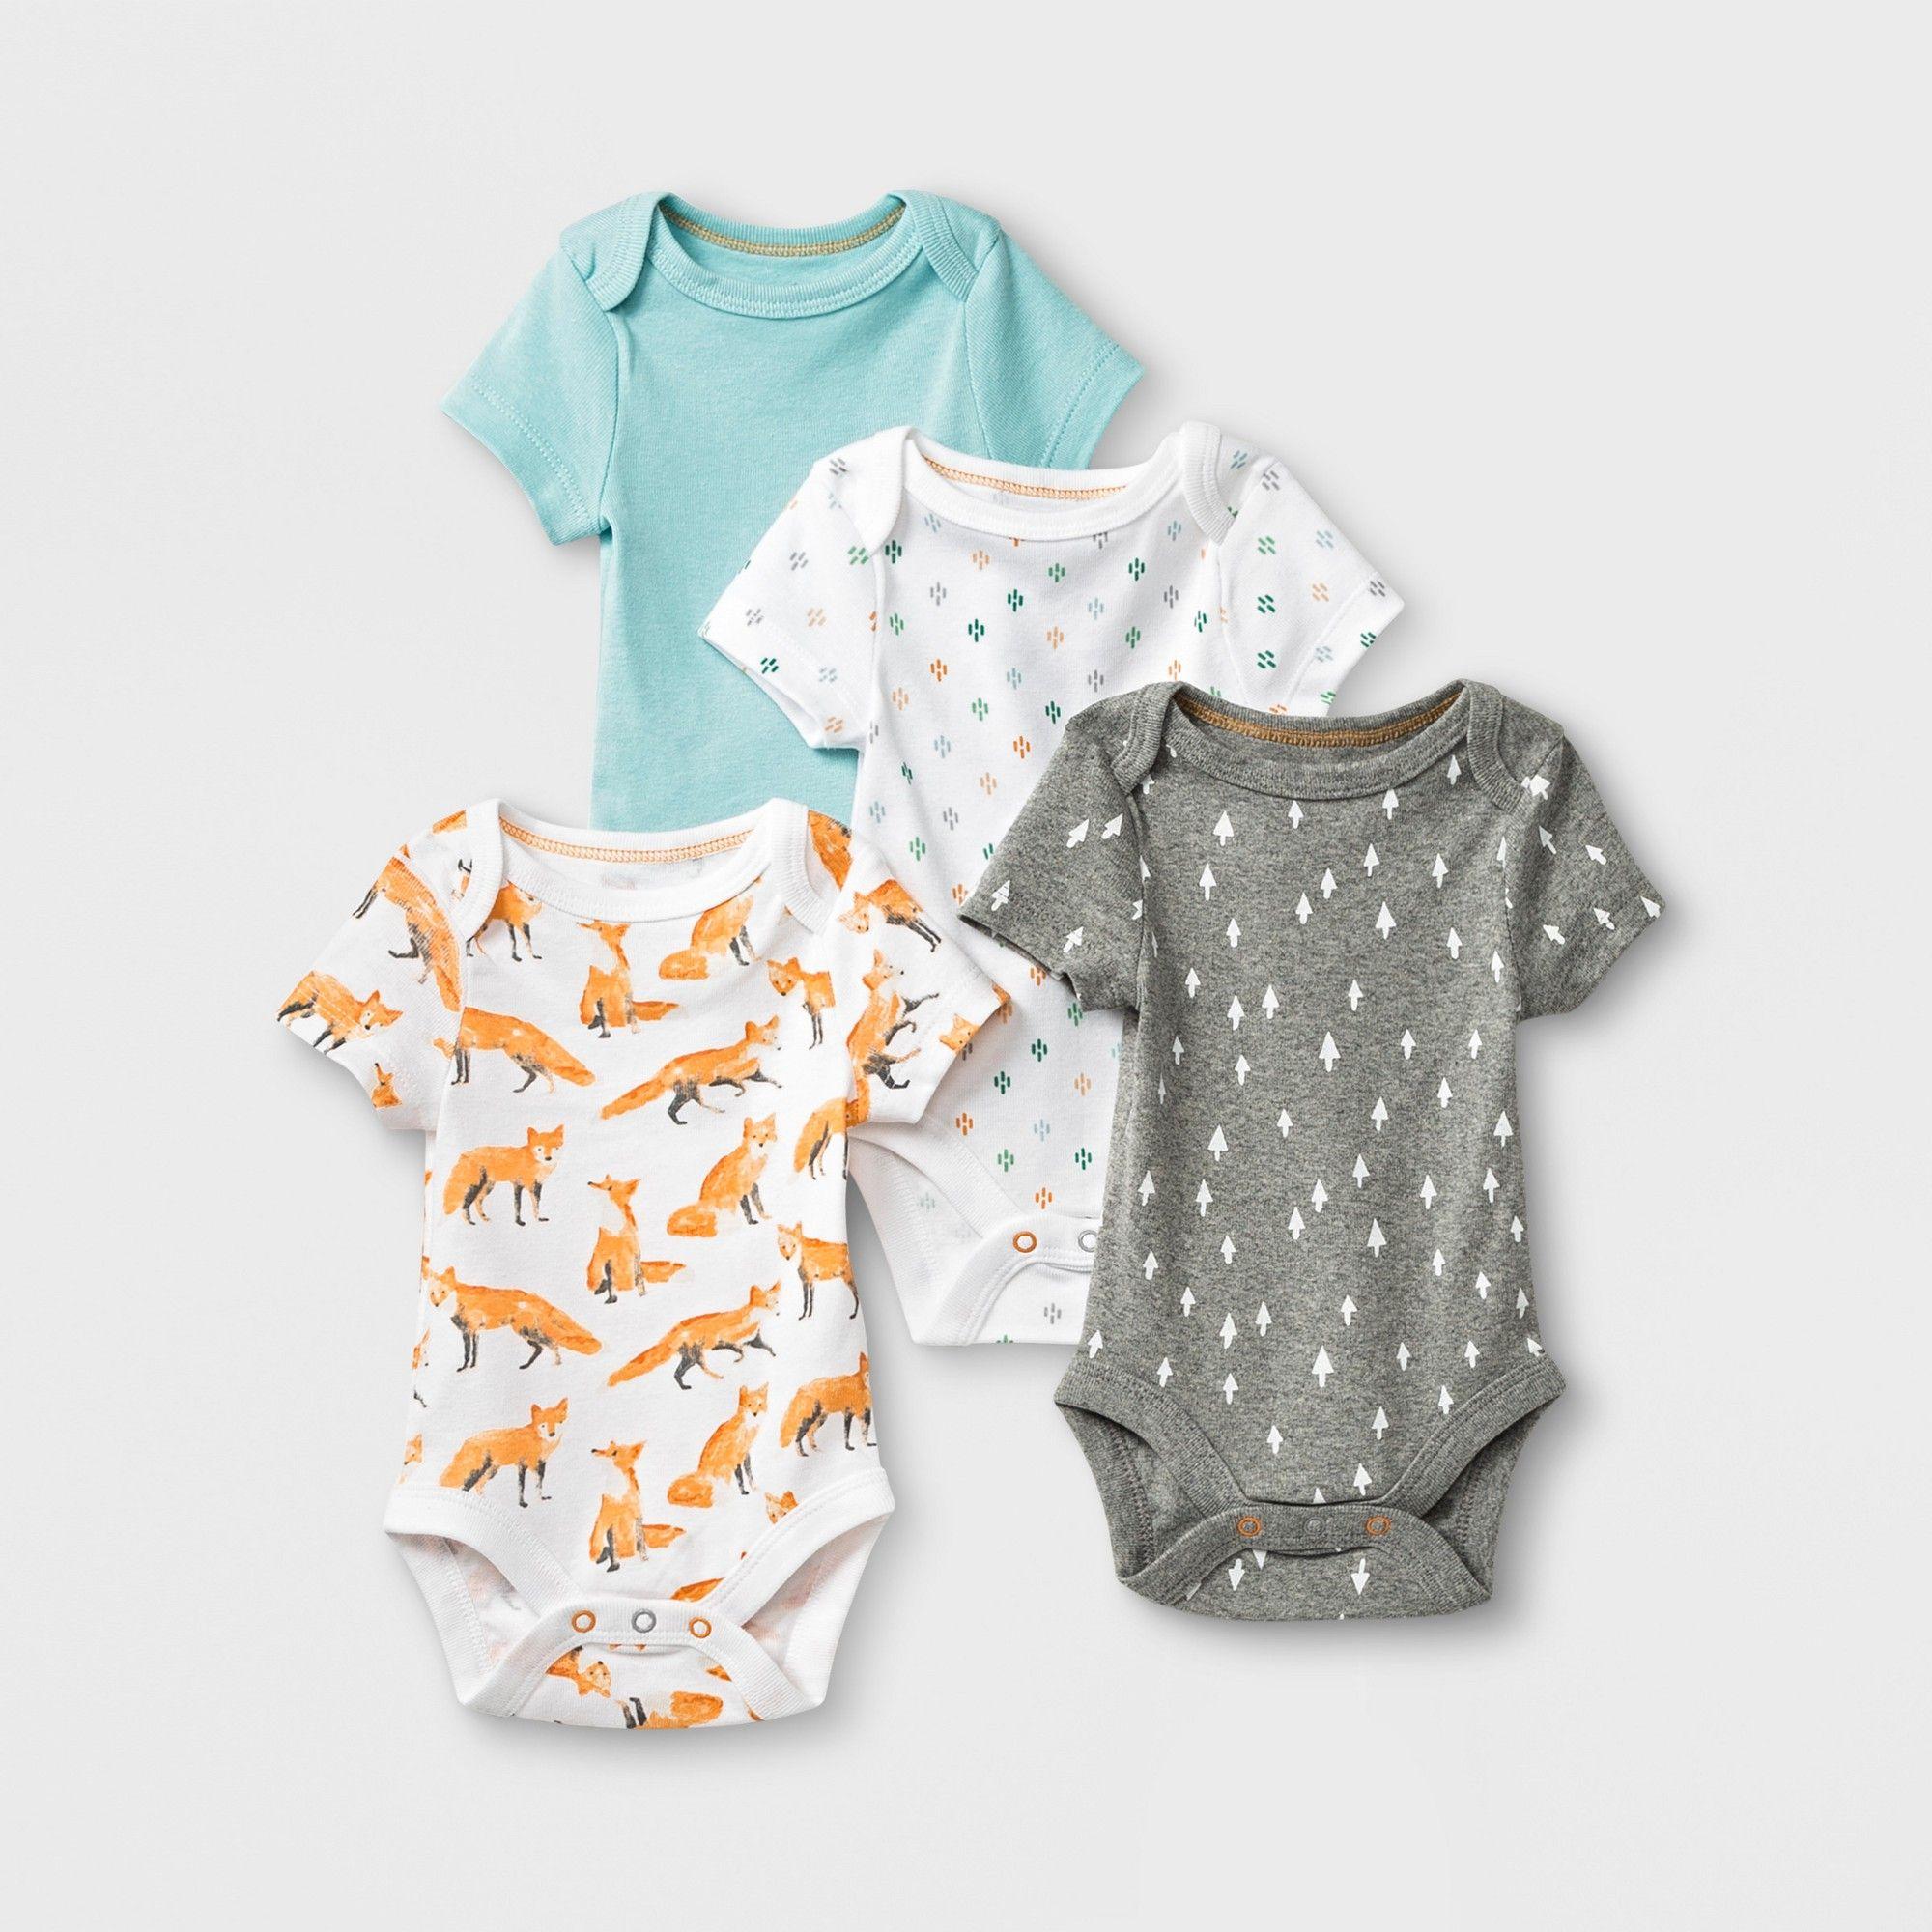 9b7c8bfc9 Baby 4pk Short Sleeve Bodysuit - Cloud Island Newborn, Newborn Unisex,  Multicolored